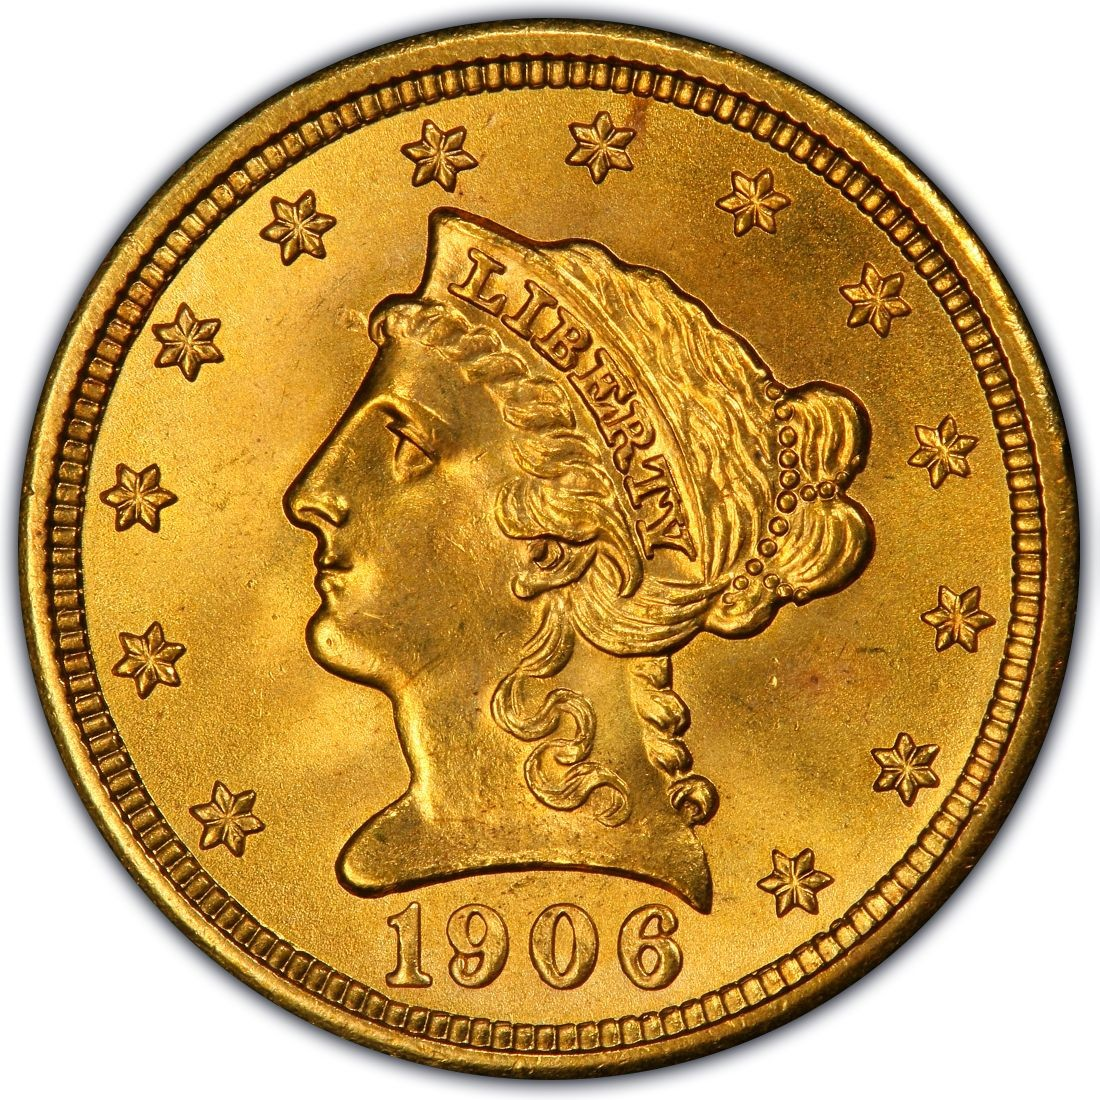 1906 Liberty Head $2 50 Gold Quarter Eagle Coin Values and